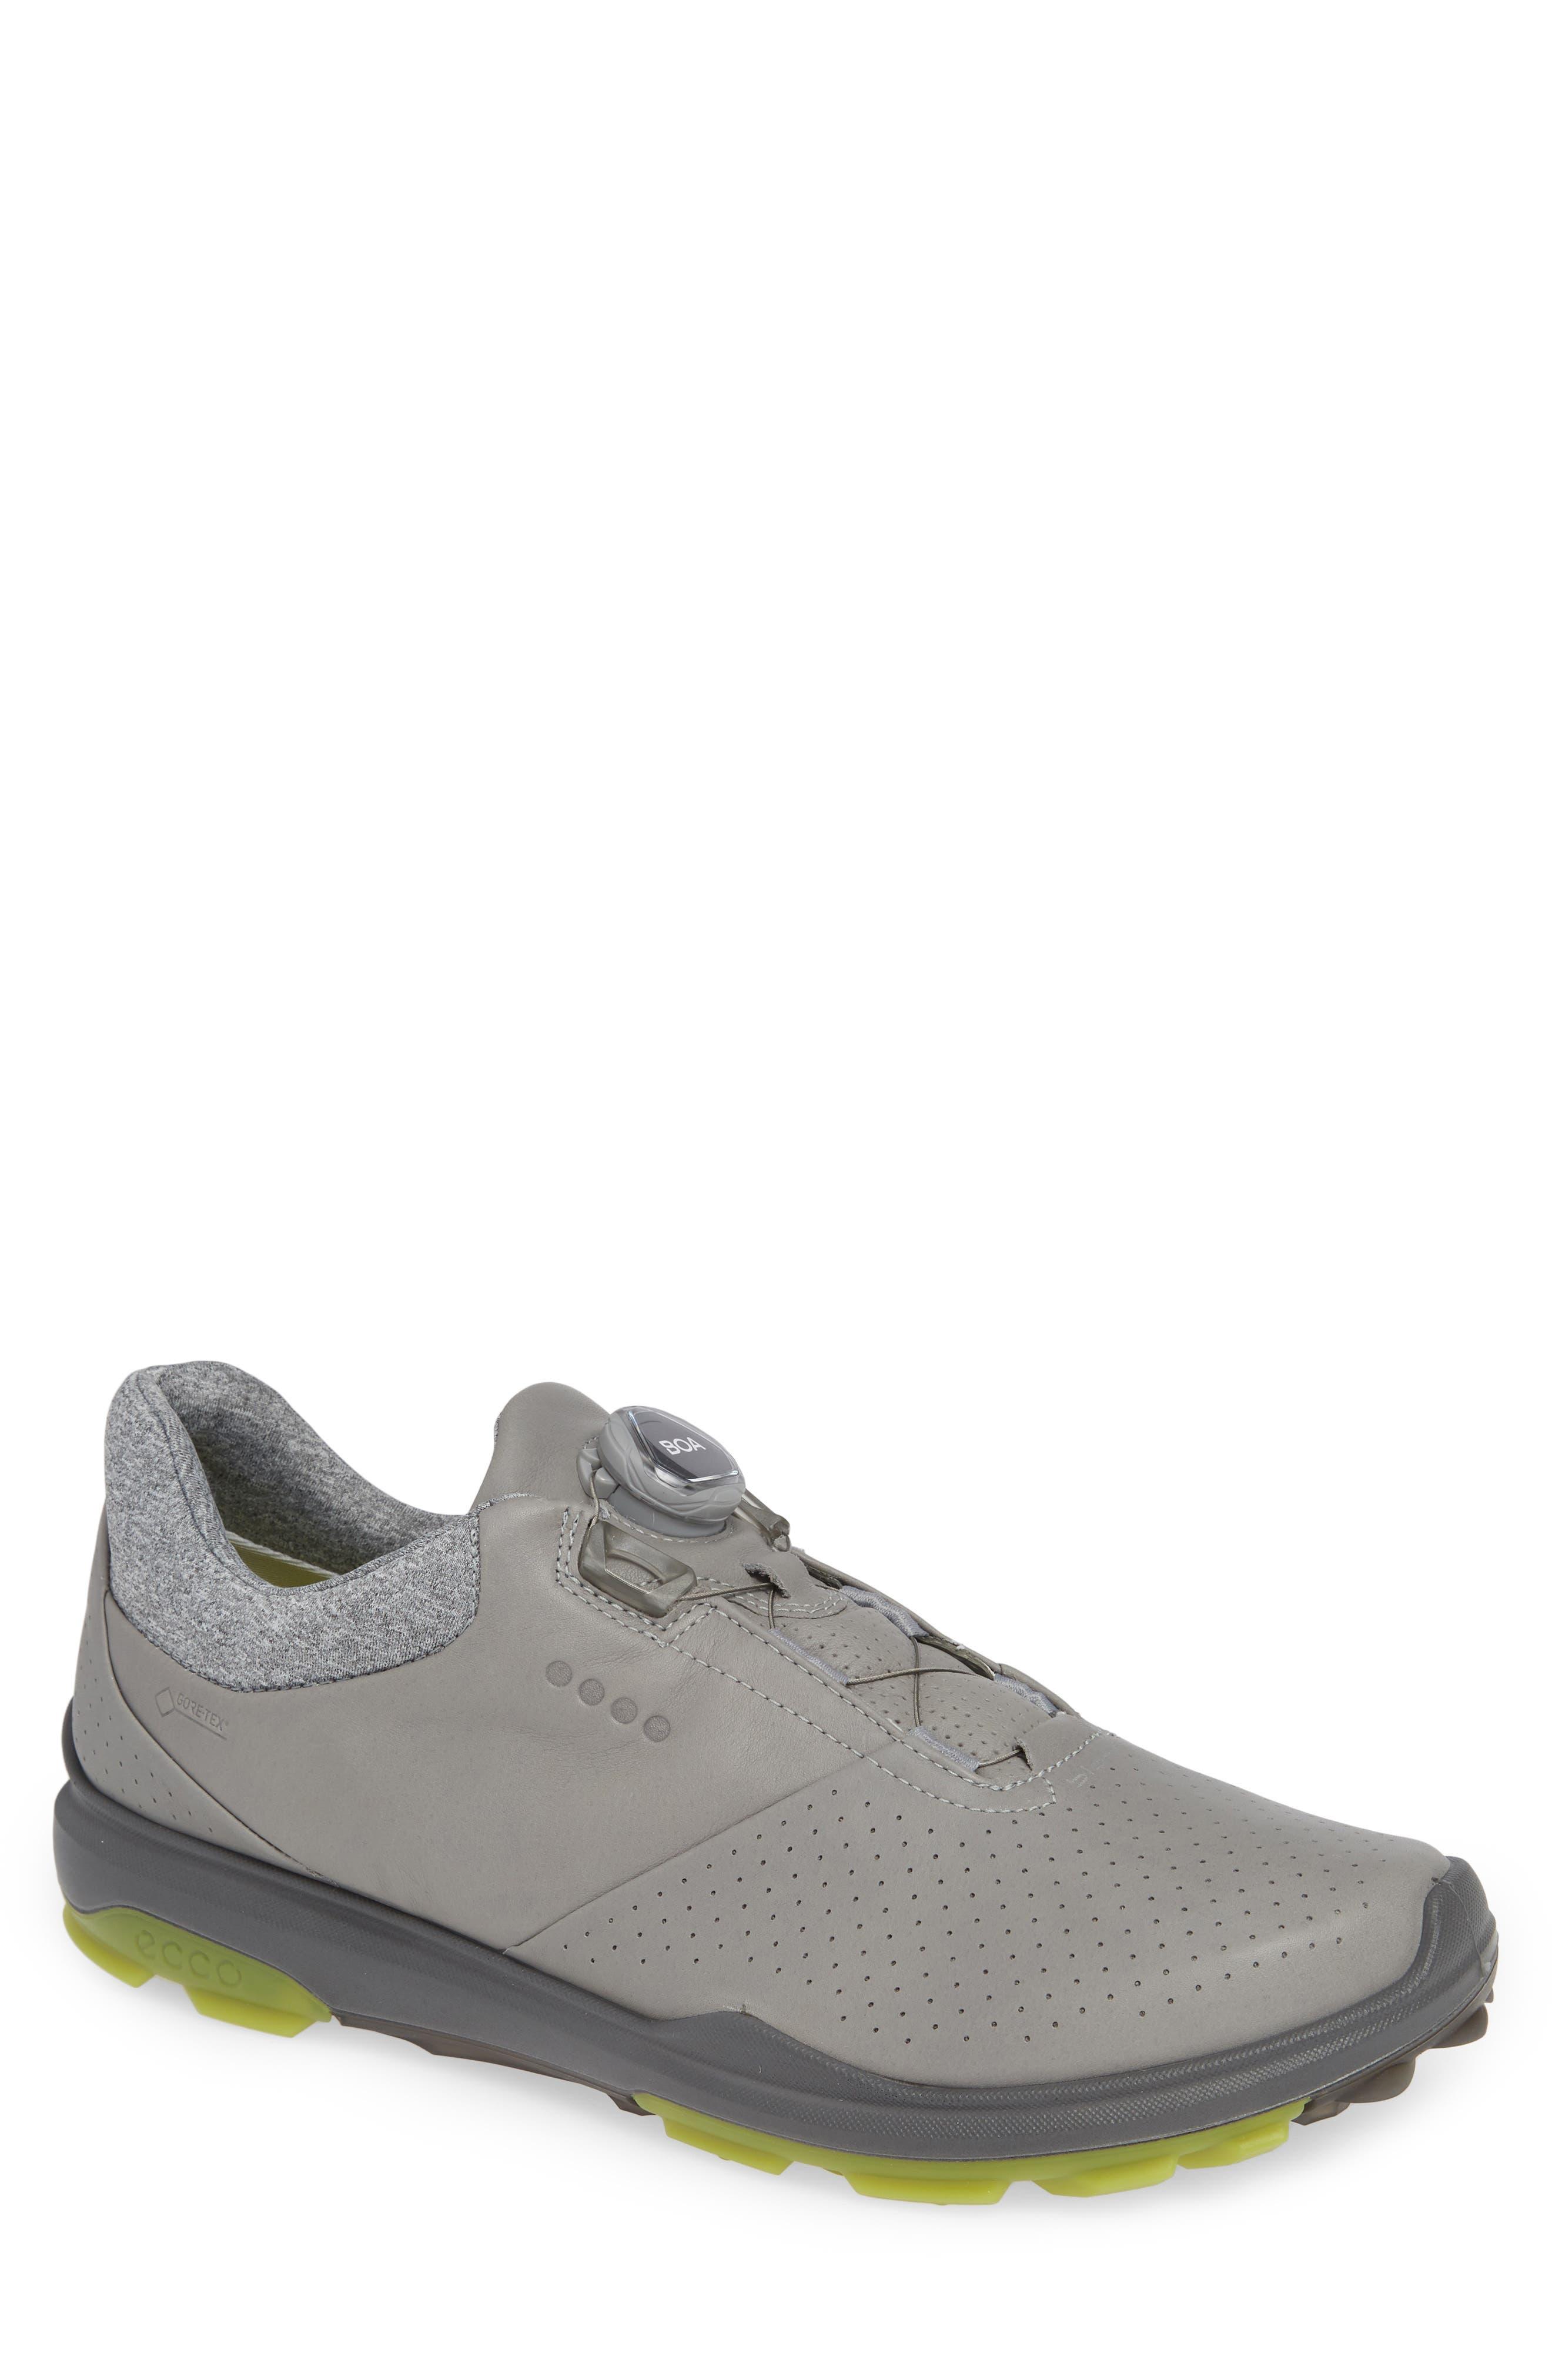 ECCO BIOM Hybrid 3 Gore-Tex<sup>®</sup> Golf Shoe, Main, color, WILD DOVE/ KIWI LEATHER